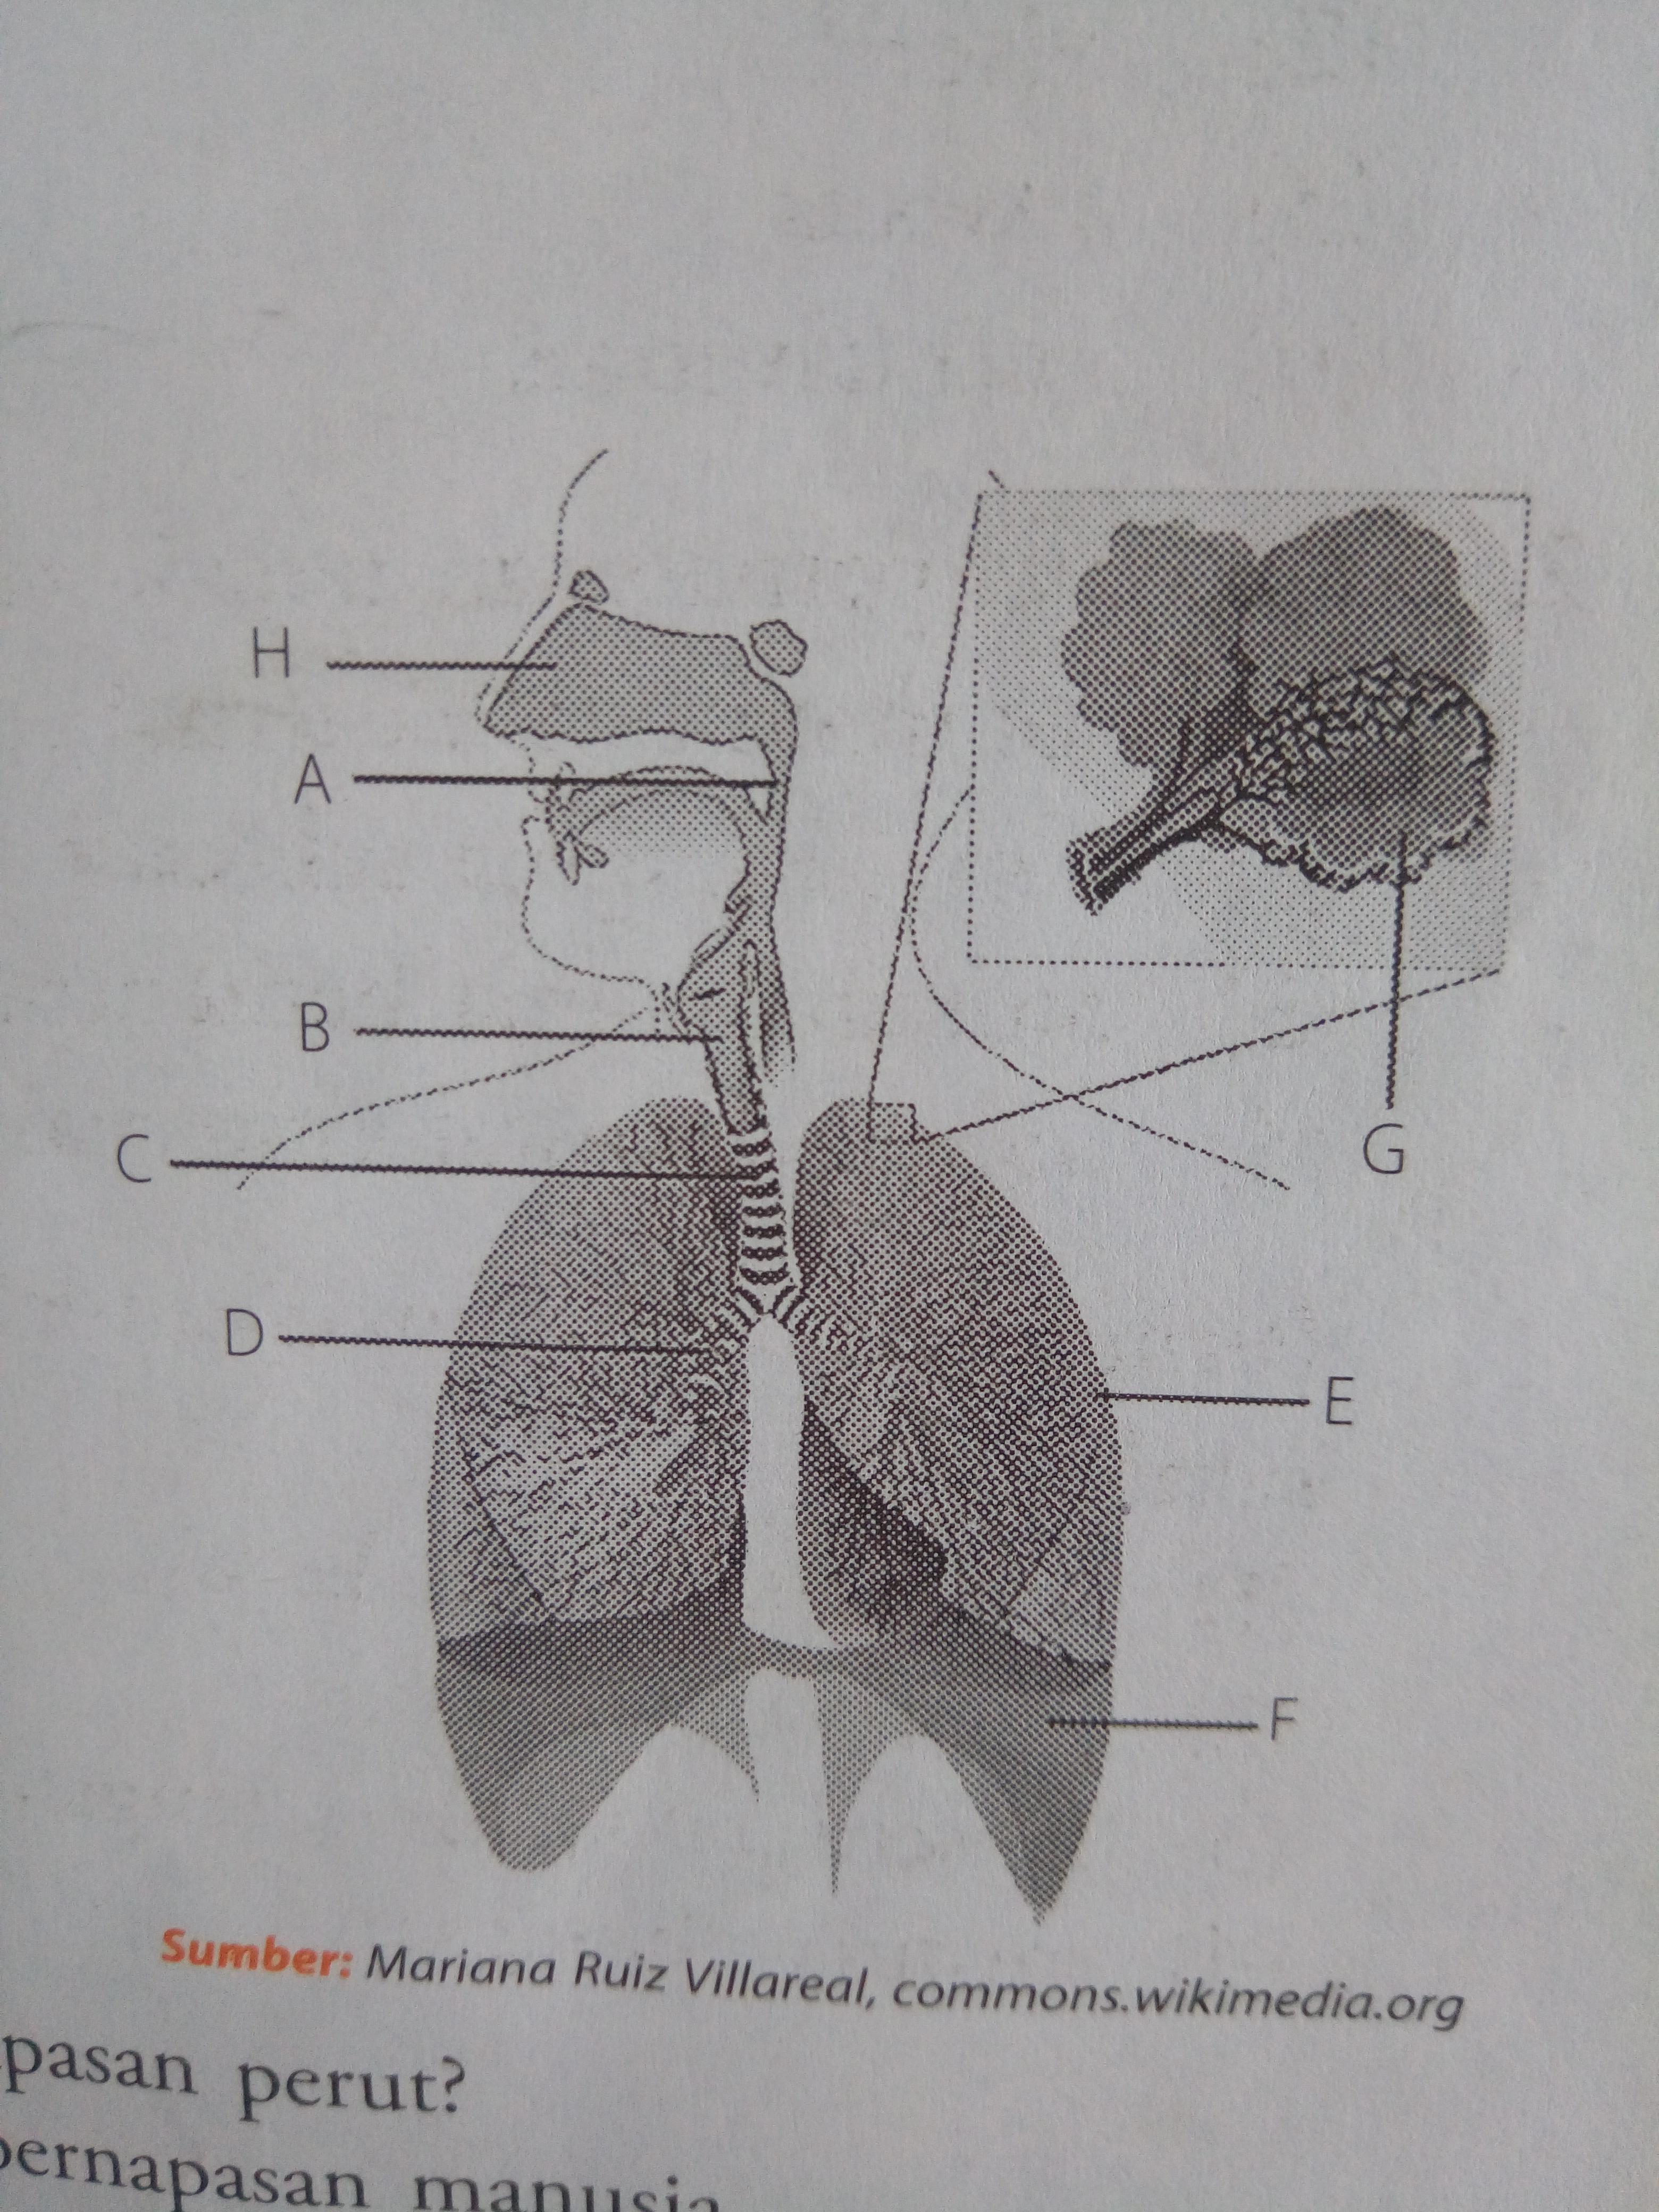 Perhatikan Gambar Sistem Pernapasan Manusia Di Samping Sebutkan Nama Bagian A B C D E F G Dan H Brainly Co Id